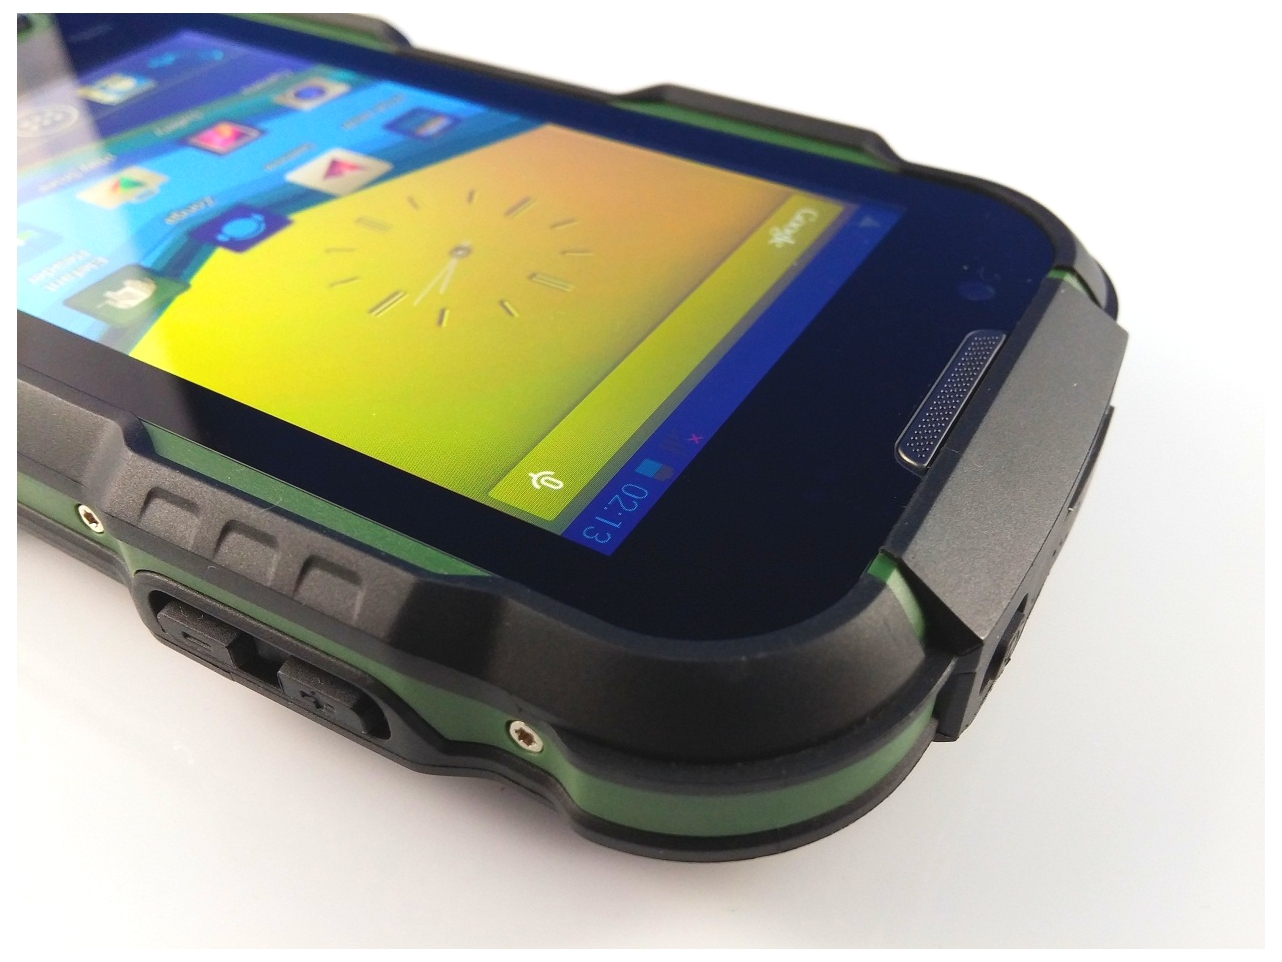 20151123_152753 Review UTOK Explorer 4, telefonul cu adevarat rezistent!